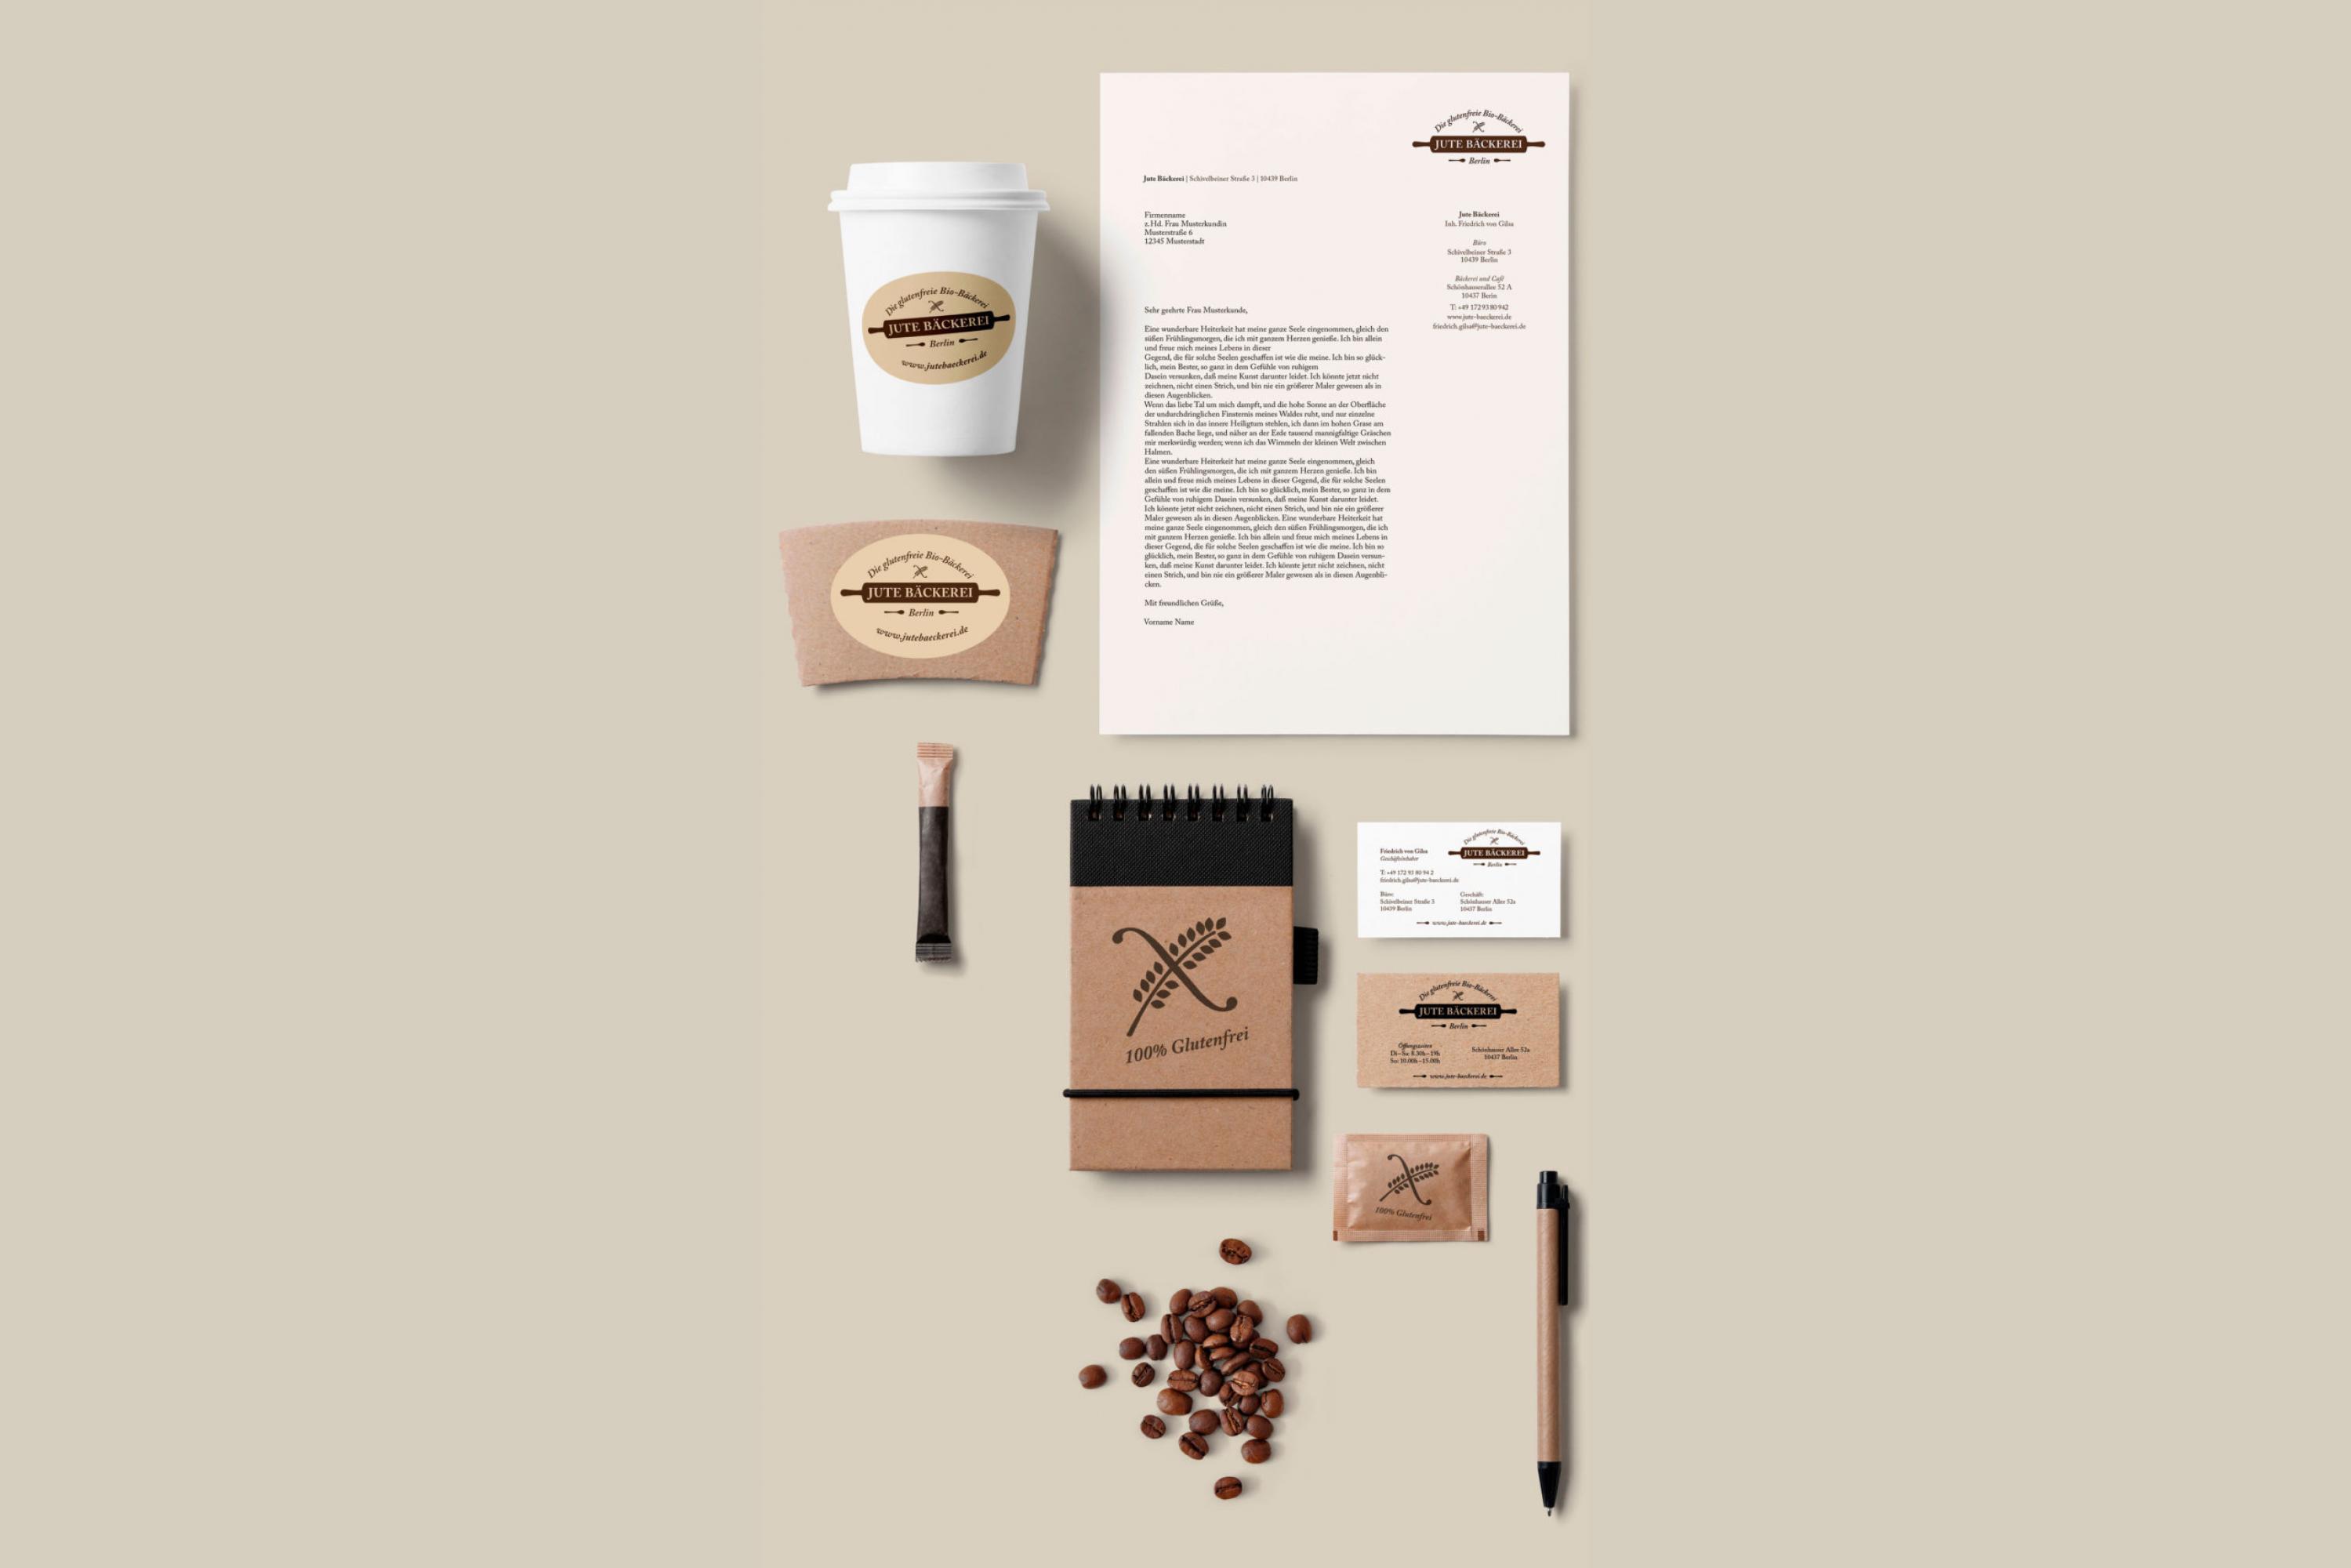 Glutenfreie-Bäckerei-Berlin-Jute-Bäckerei-Corporate-Design-01-B Kopie